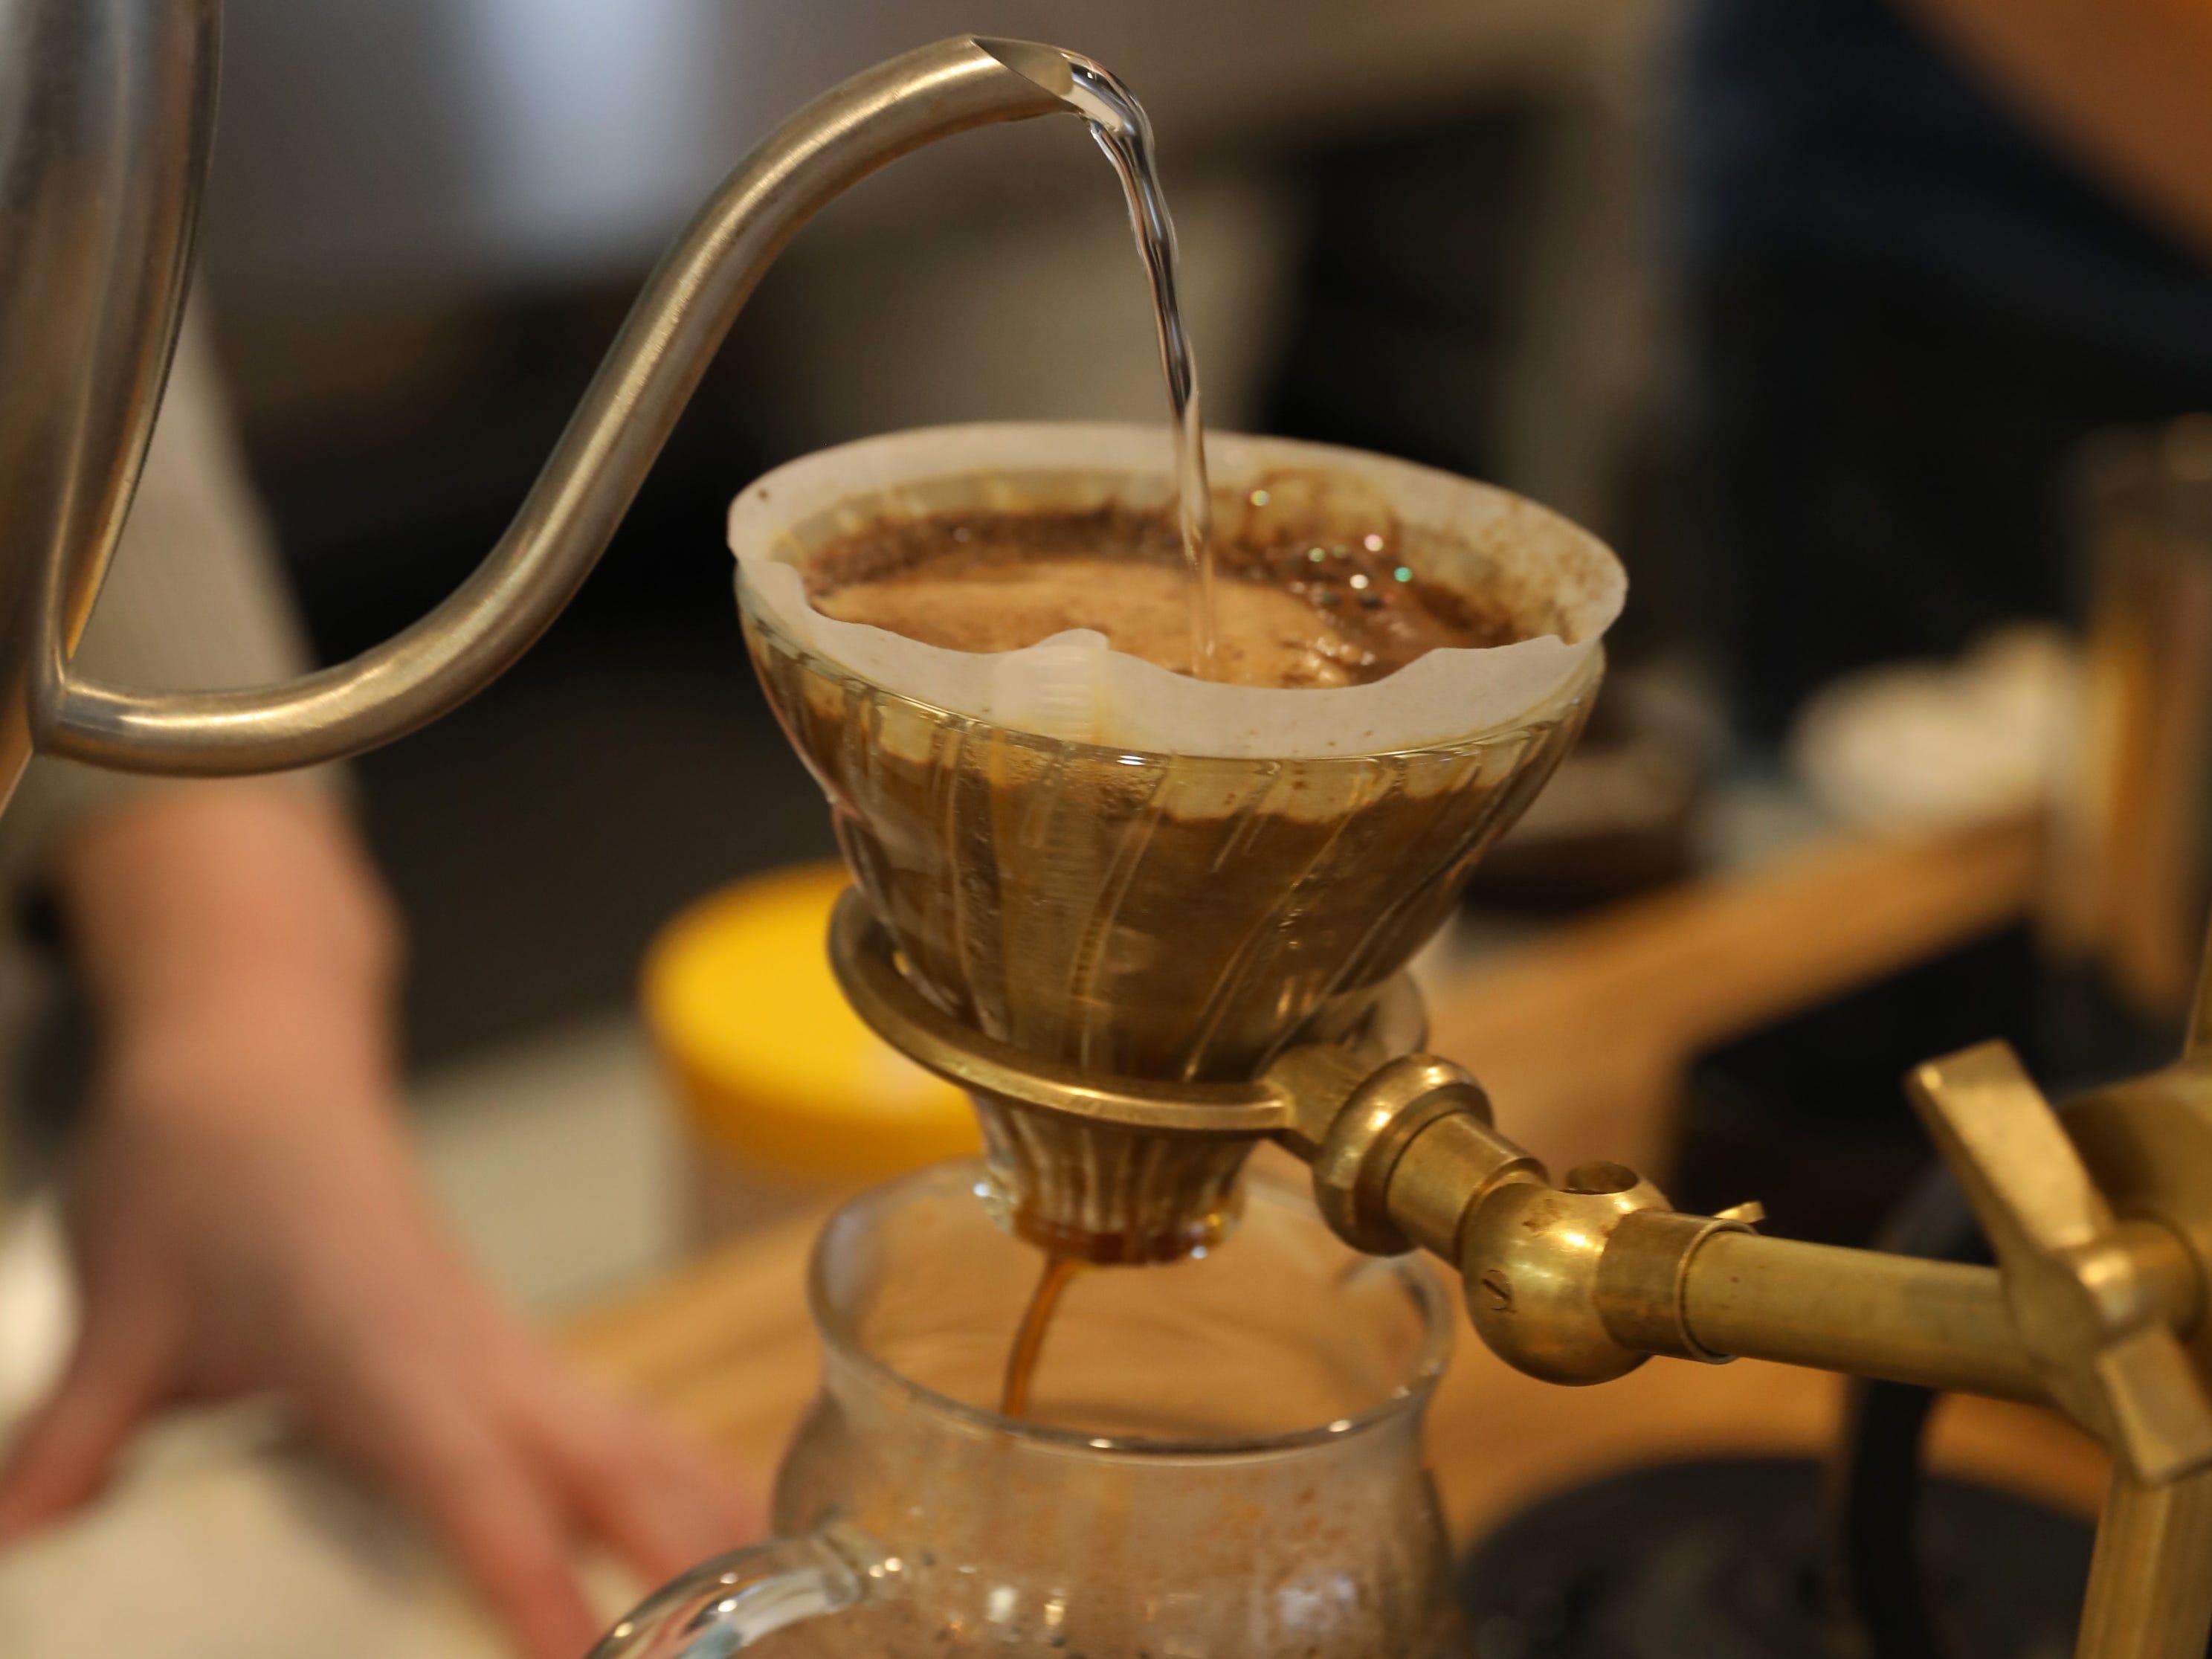 Dena Jones, partner, uses a Hario V60 brewing method as she prepares a order of Ethiopian coffee.